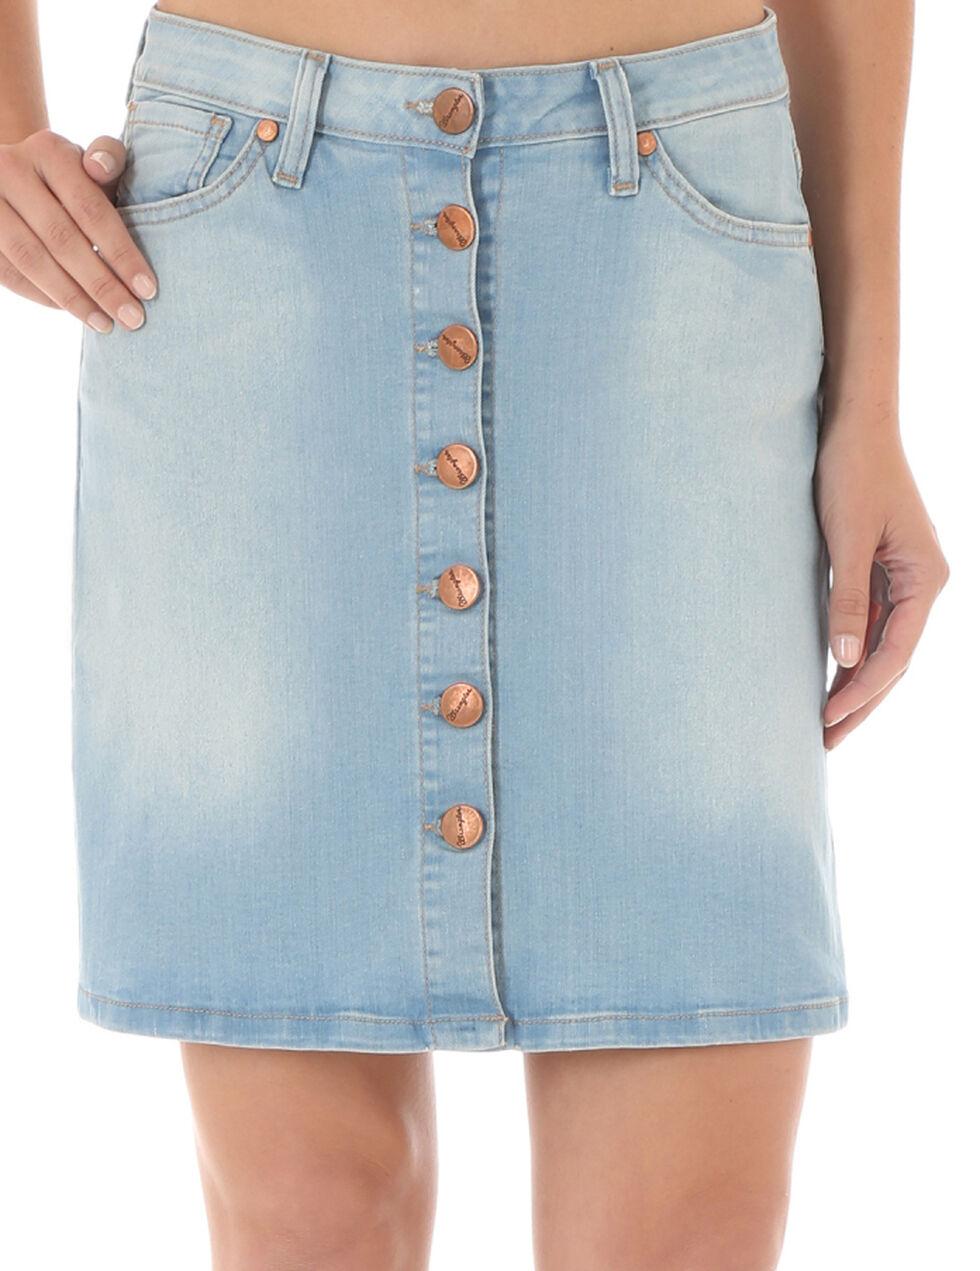 Wrangler Women's Button-Front Denim Skirt, Indigo, hi-res